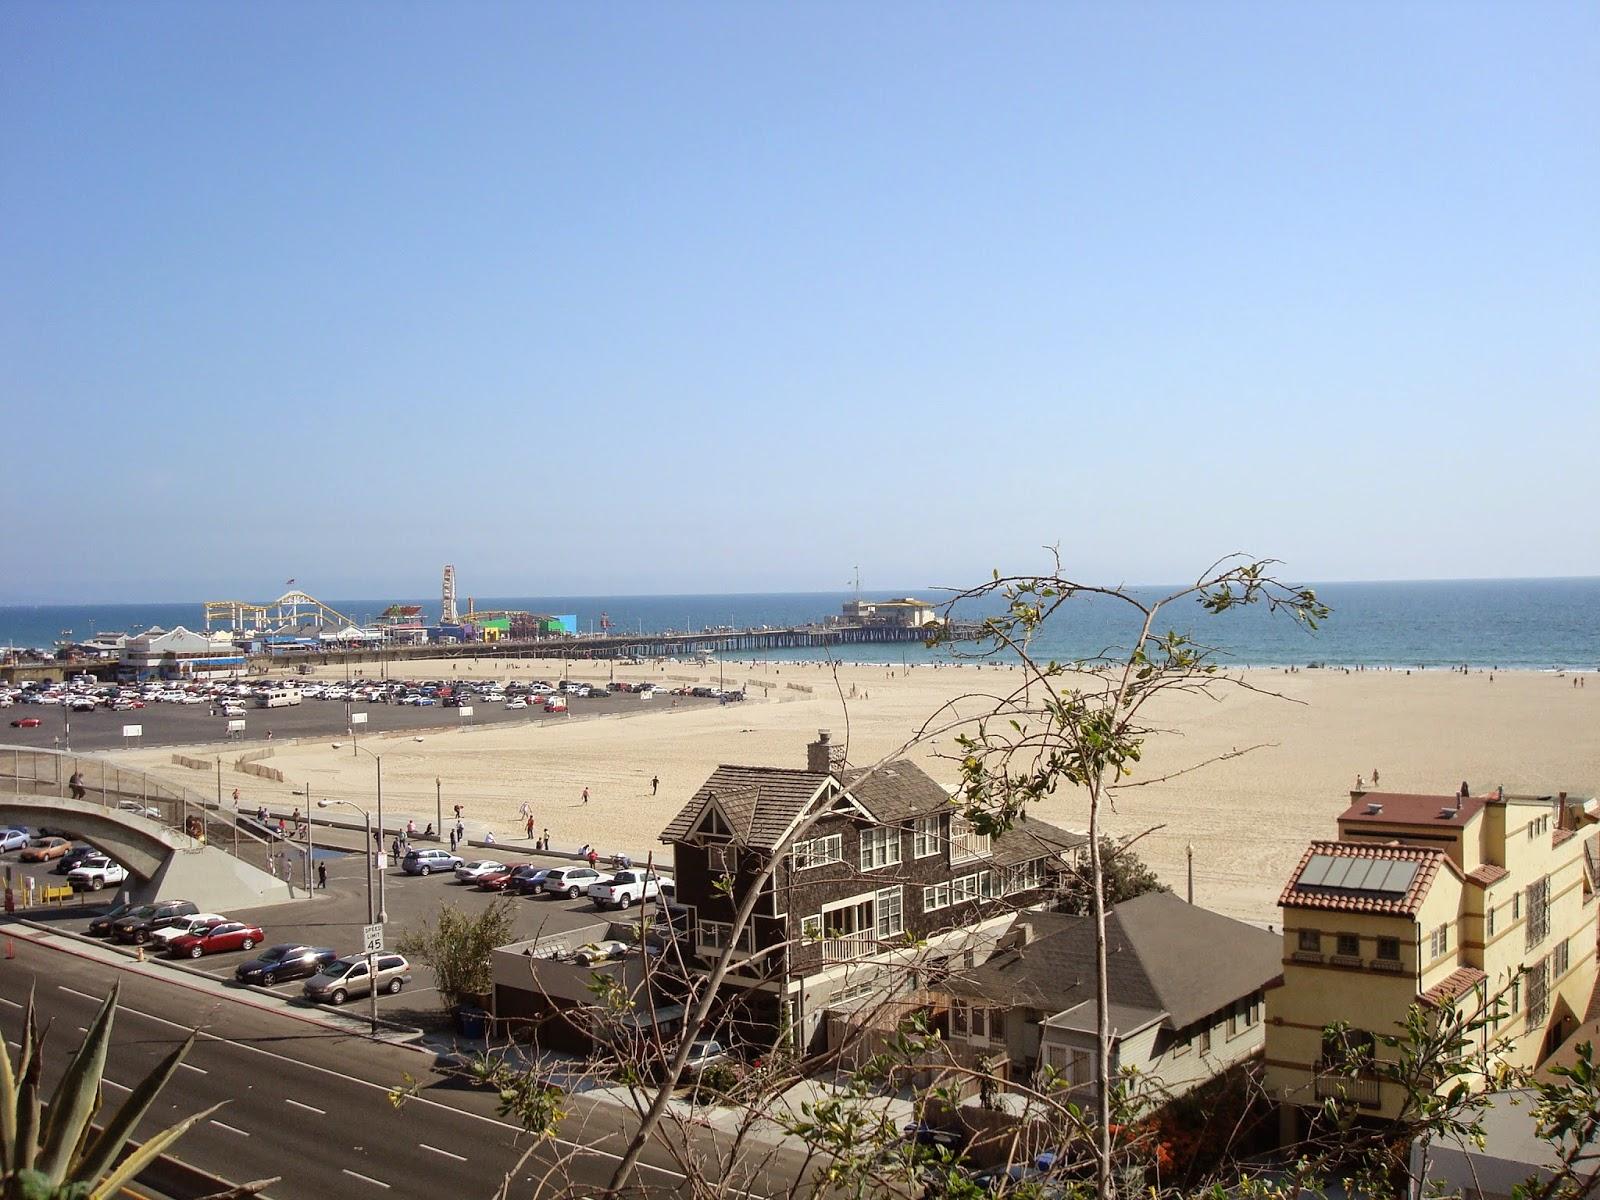 Los Angeles - Santa Monica et Venice Beach